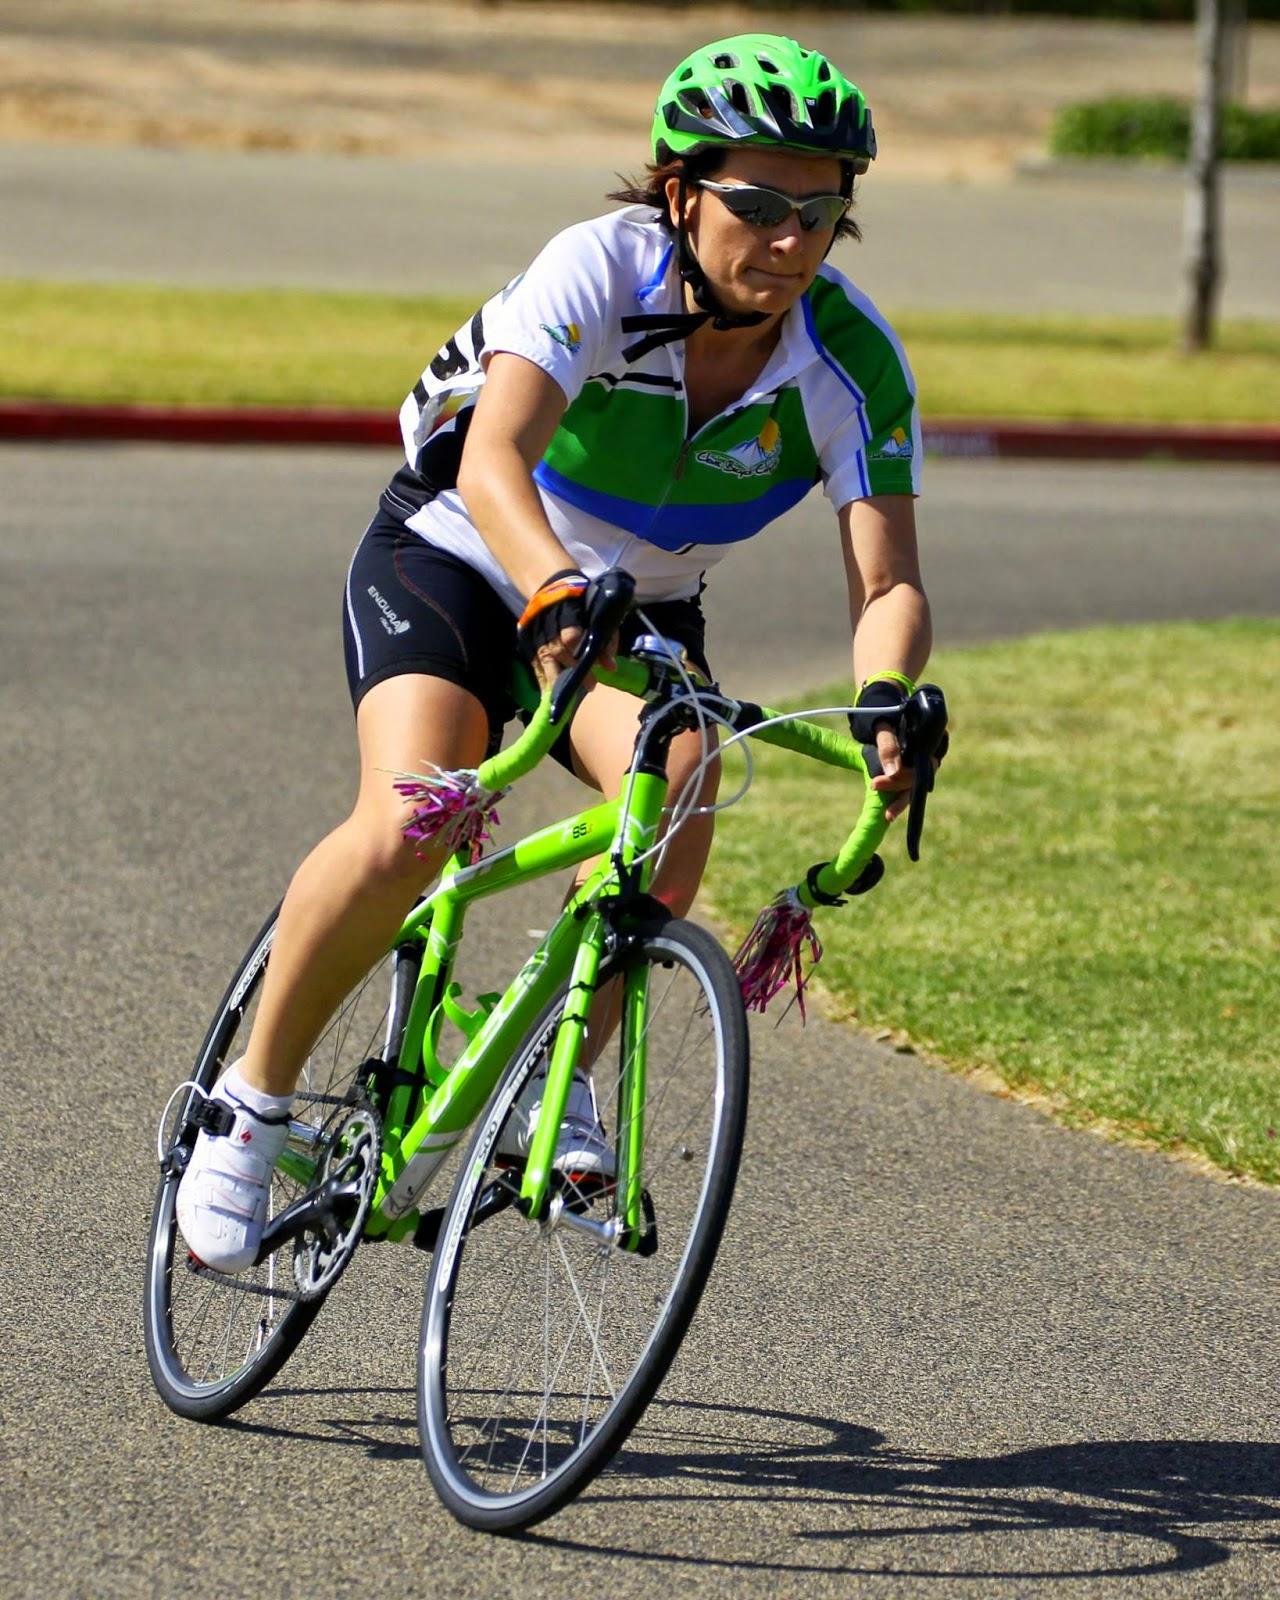 Beth Bridges, The Networking Motivator and Triathlete